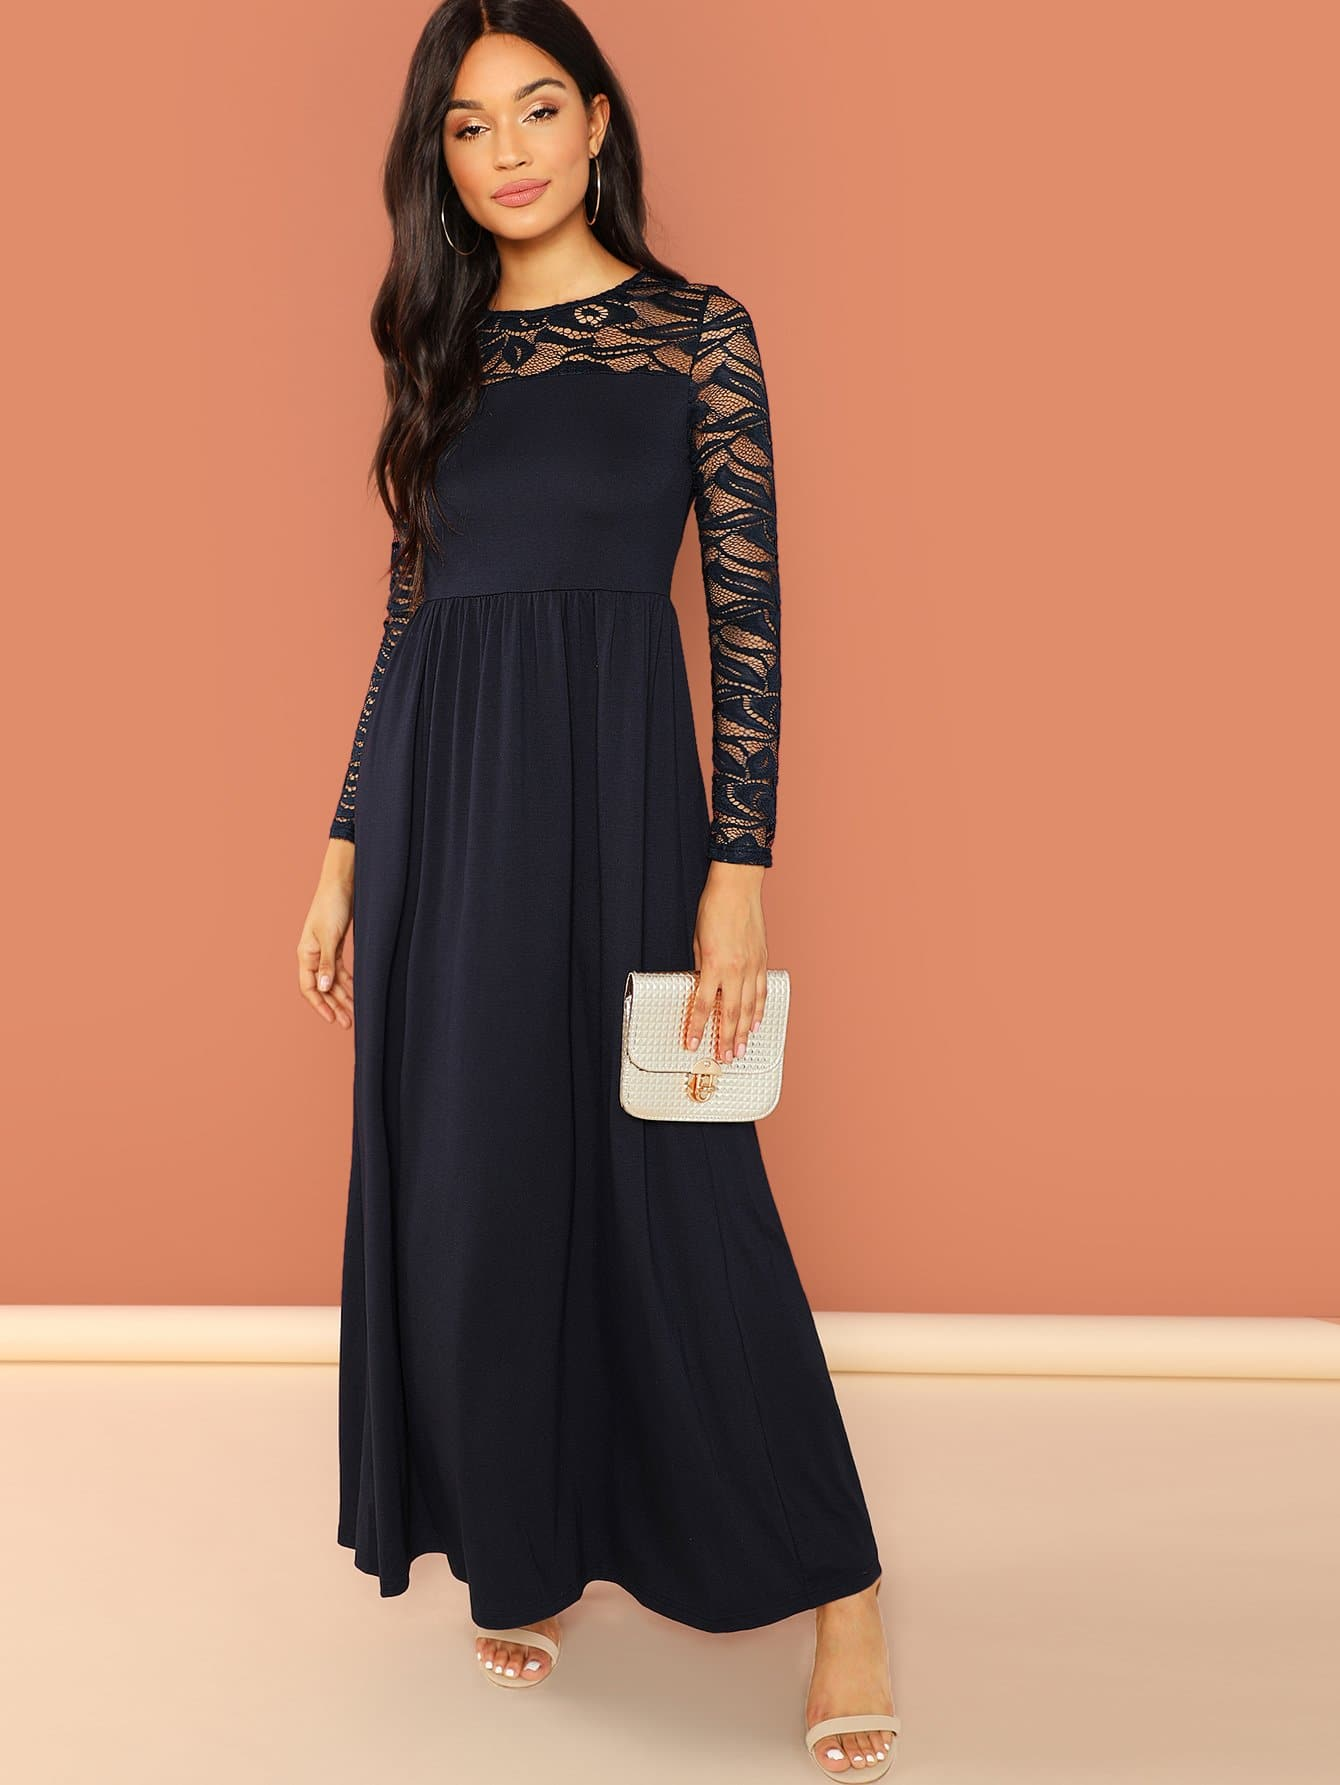 7272cadf07cd Lace Contrast Raglan Sleeve Dress -SheIn(Sheinside)